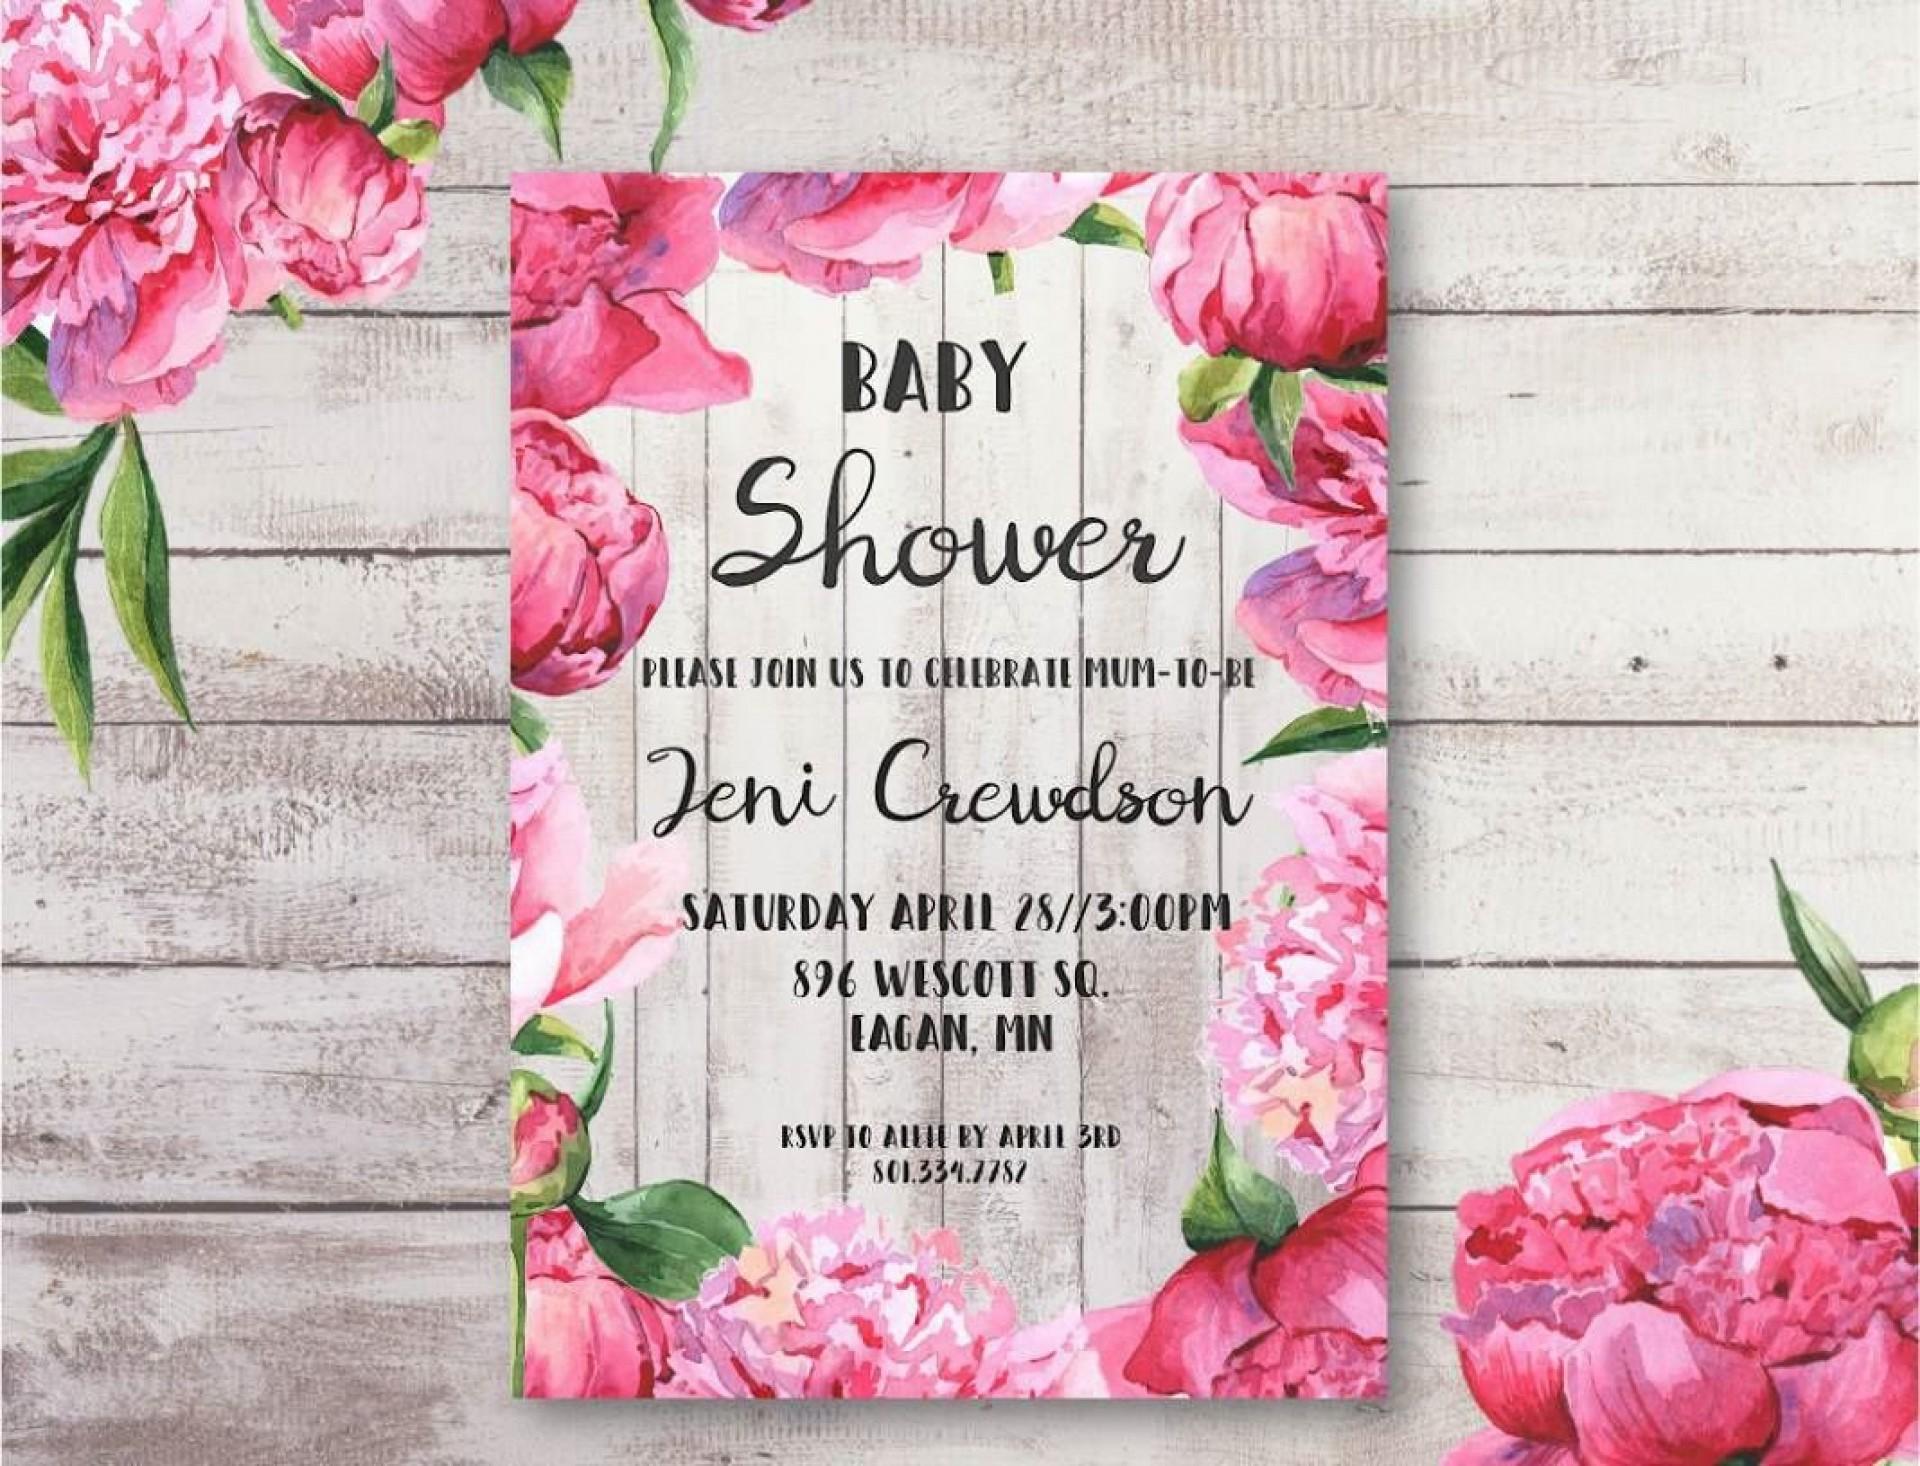 006 Incredible Free Baby Shower Template Printable Design  Invitation Boy Nautical1920